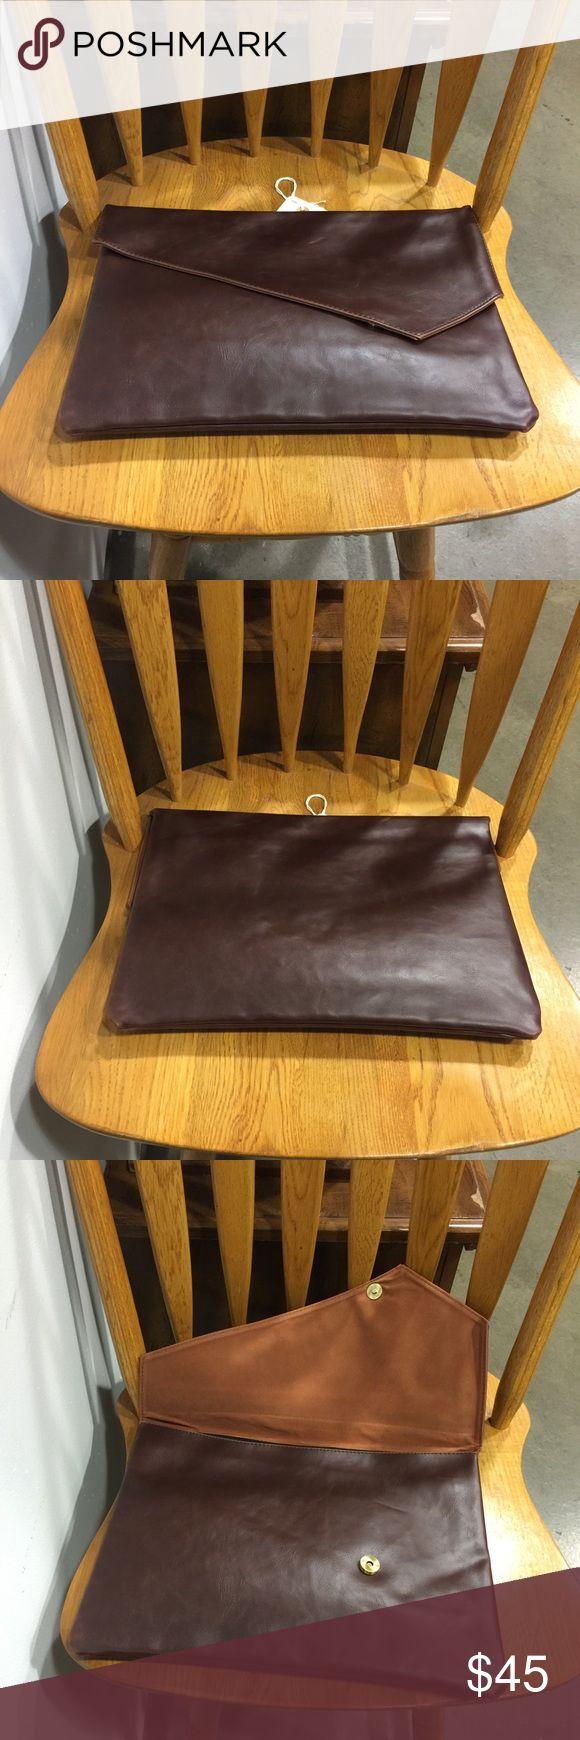 "Faux Leather Envelope Portfolio 14"" Brand new. Premium faux leather exterior. Flapover envelope snap closure. Microfiber lined interior. 14""W X 10""H X 1""D. - From Rich Mbariket, a men's shop at The Market LV at Tivoli Village Las Vegas Bags Briefcases"